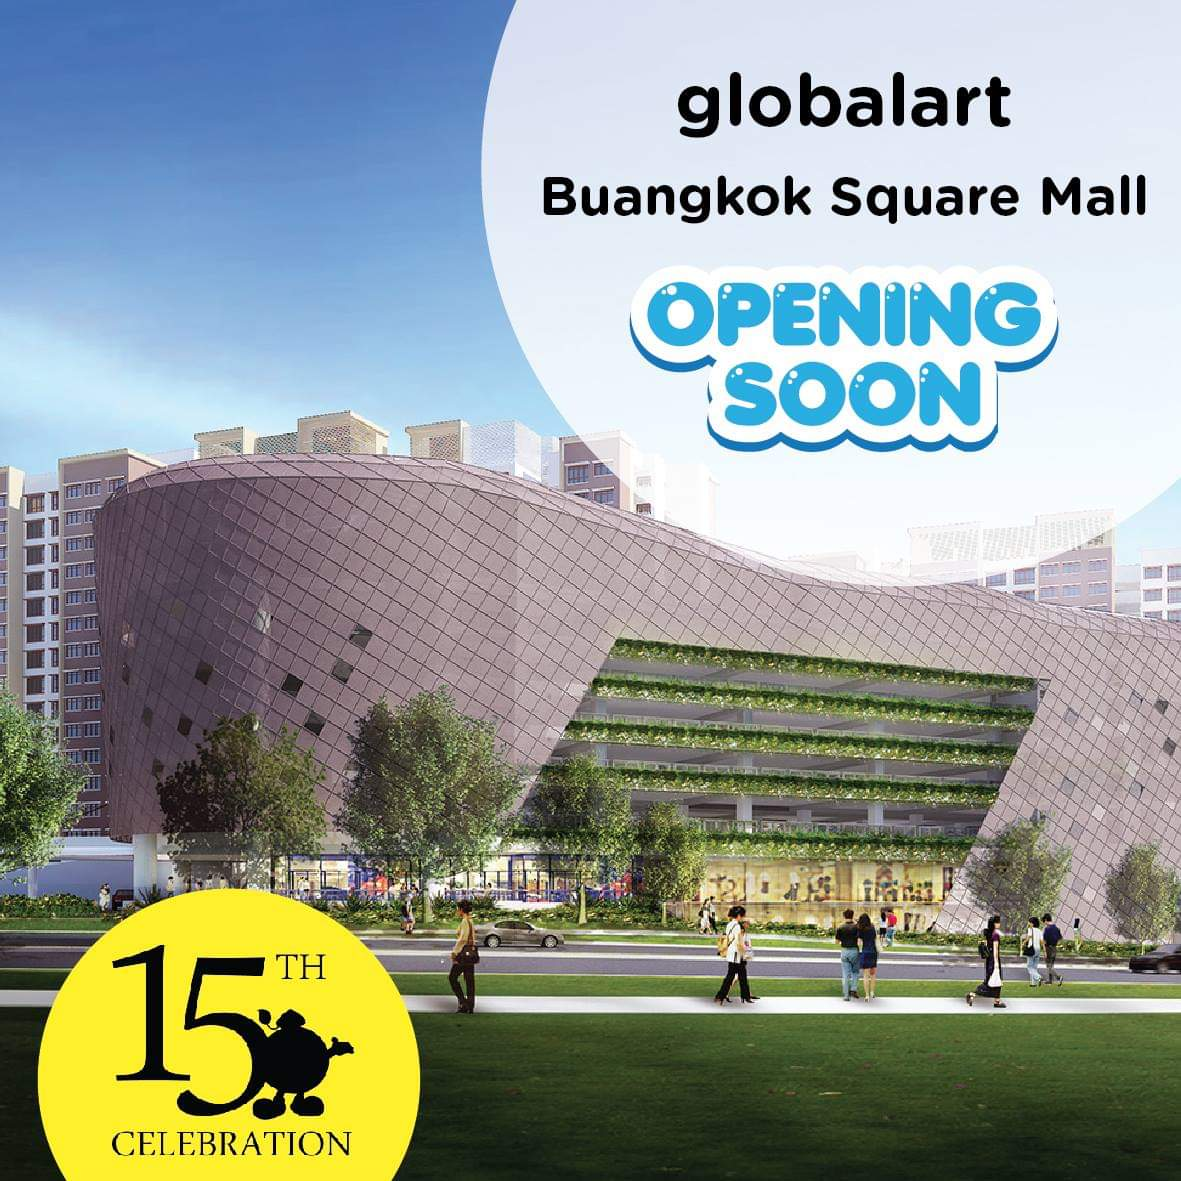 Globalart Buangkok Square Mall Opening Soon Best Art Classes Singapore Sg Get Amazing Art Courses Singapore